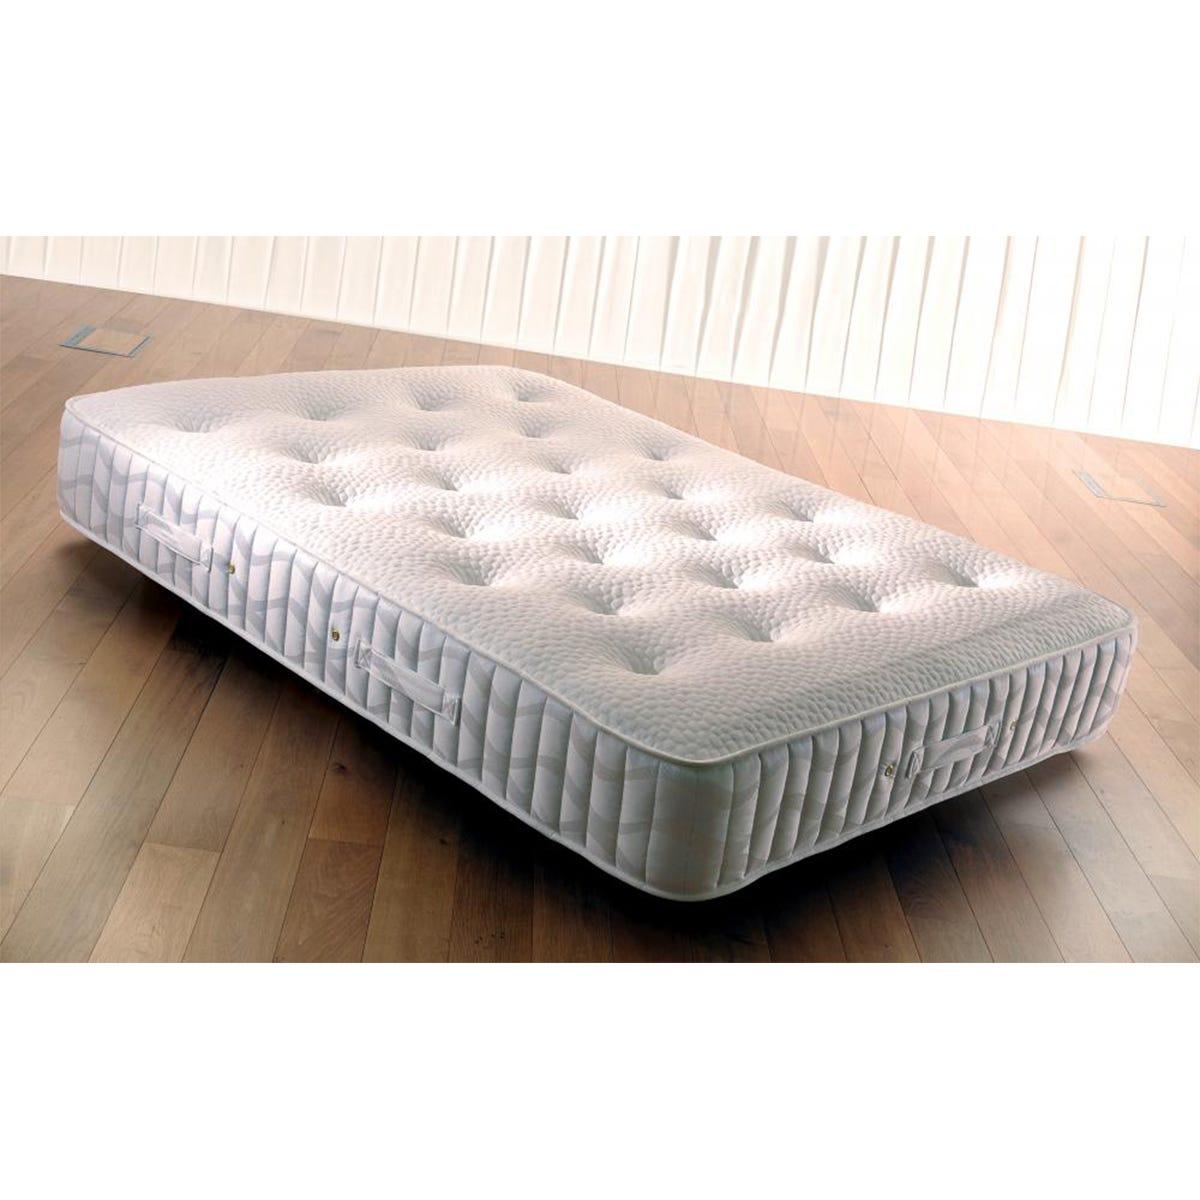 Adelia Memory Foam Pocket-sprung Orthopaedic King-Size Mattress